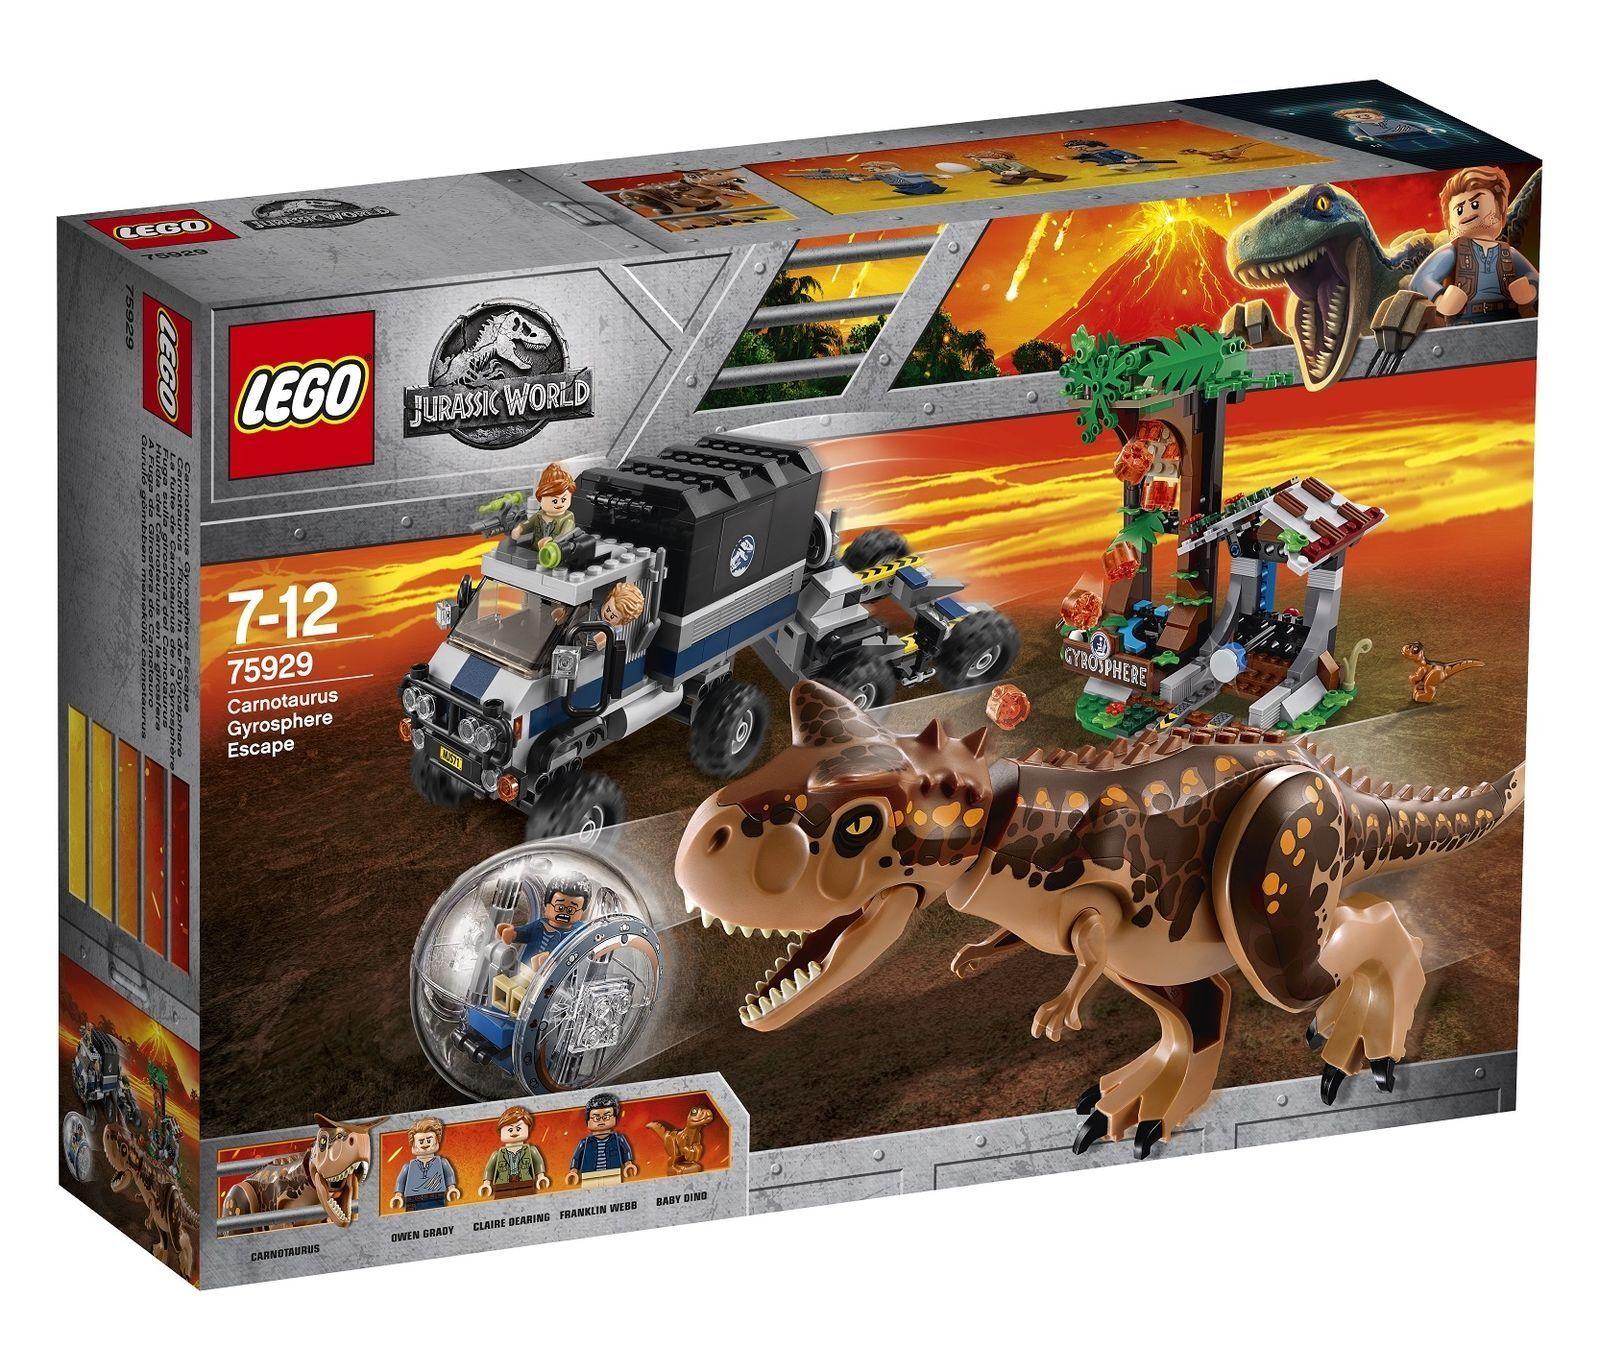 Lego 75929 Jurassic World Carnotaurus Gyrosphere Escape Building Set